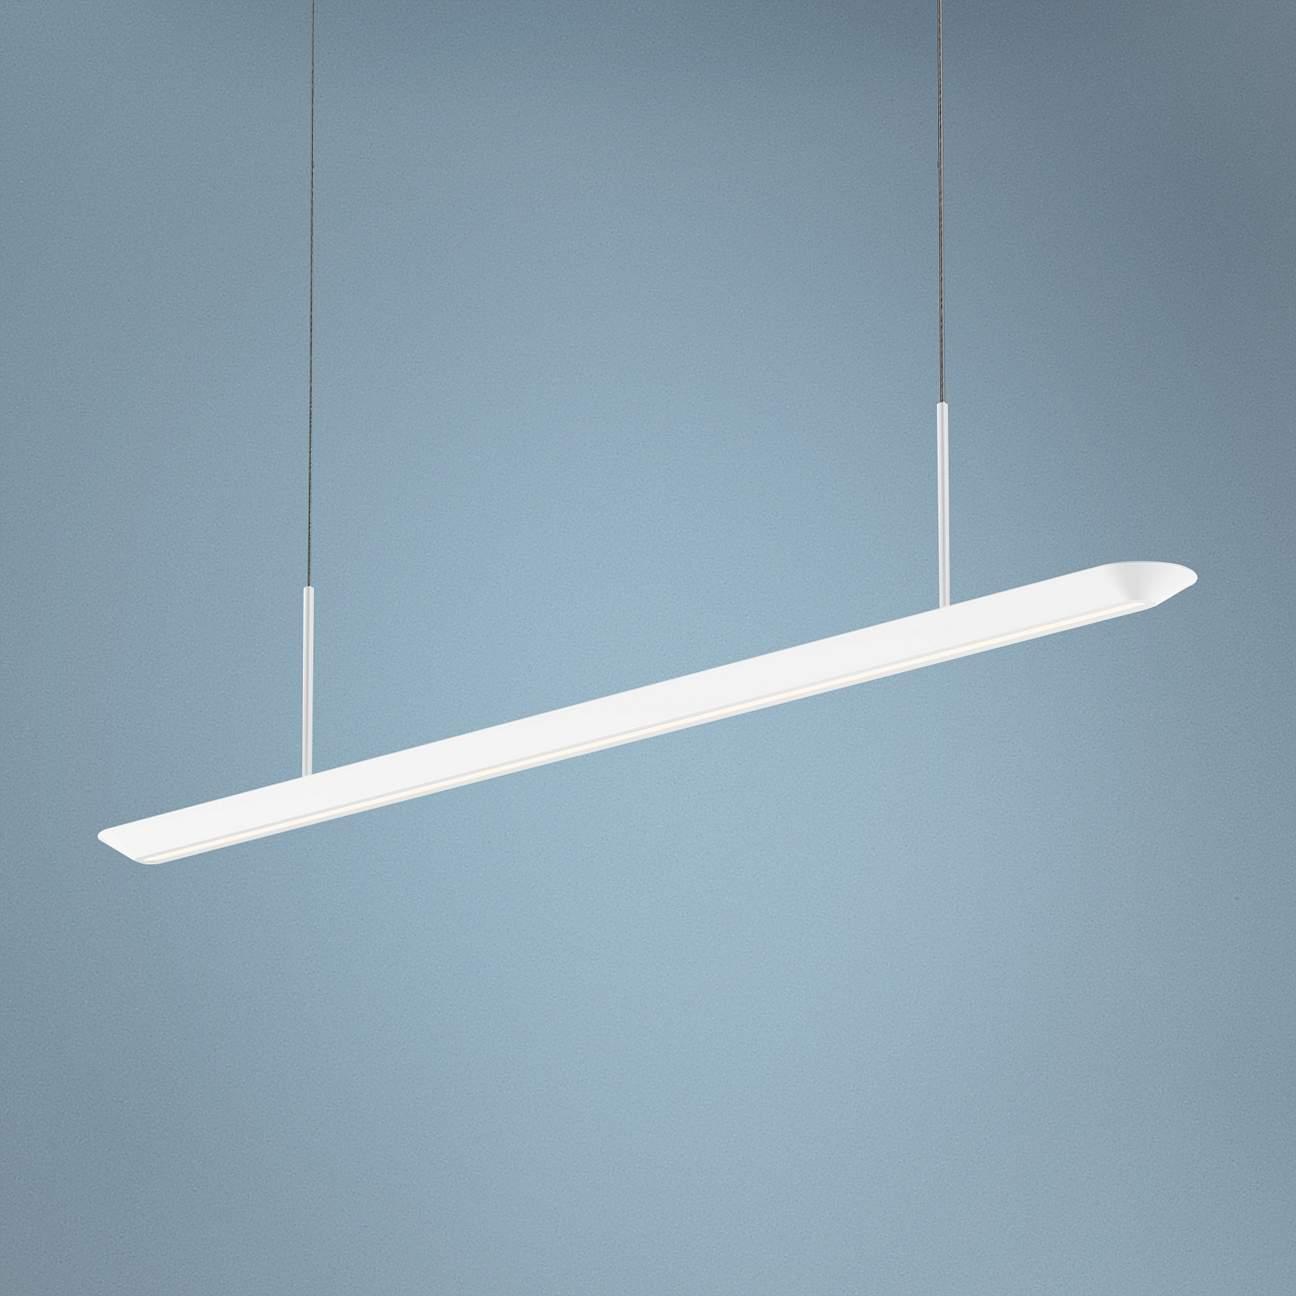 Futuristic White LED Strip Light